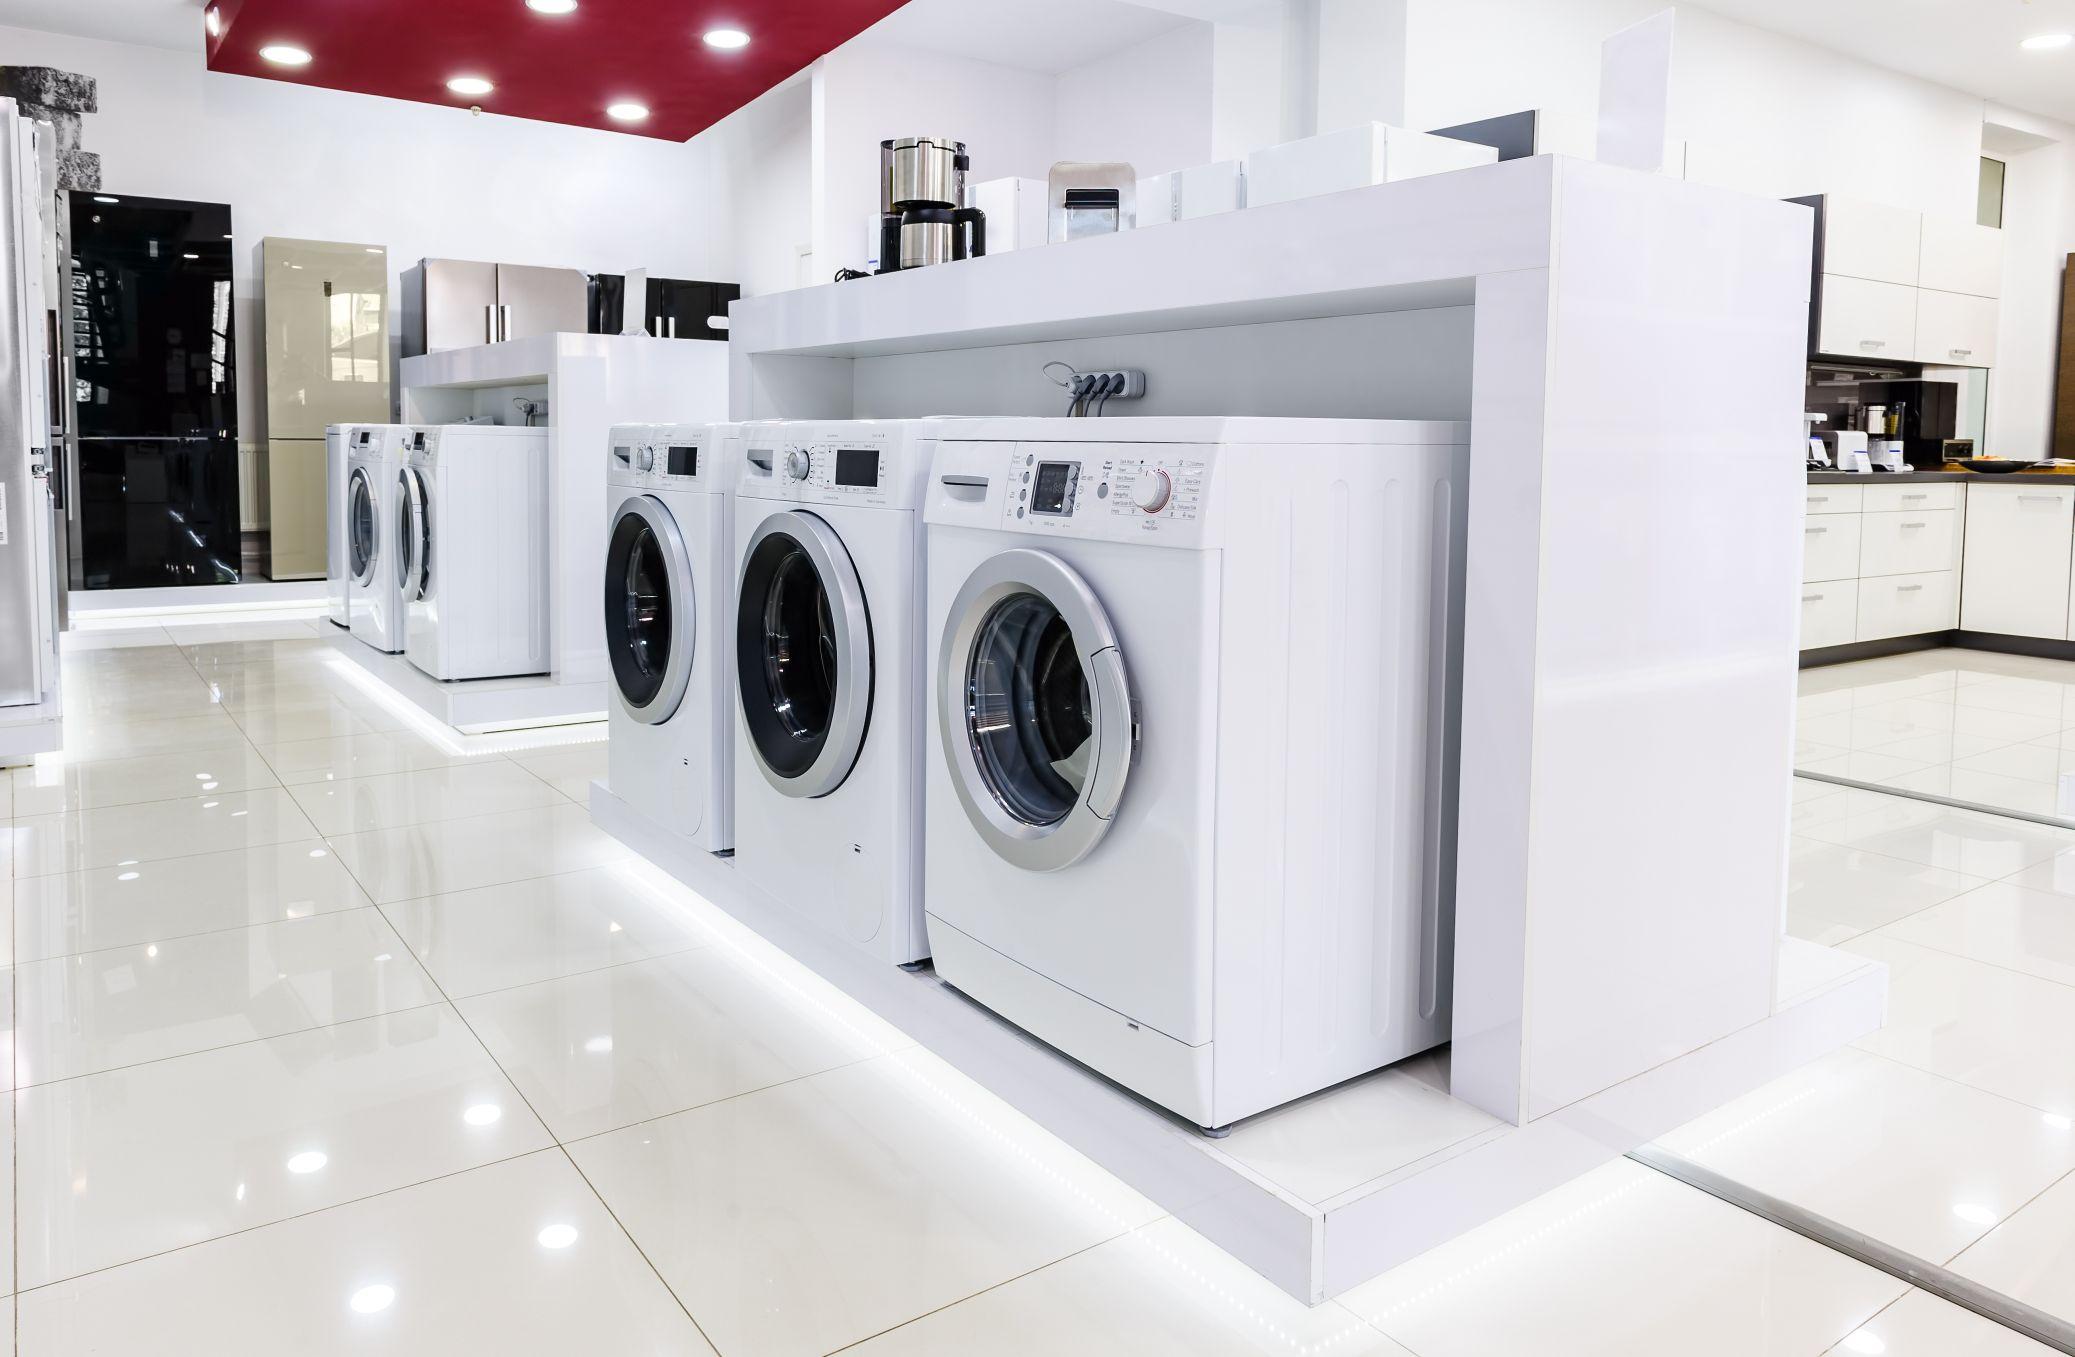 Washing Machines & Dryers - Dealers